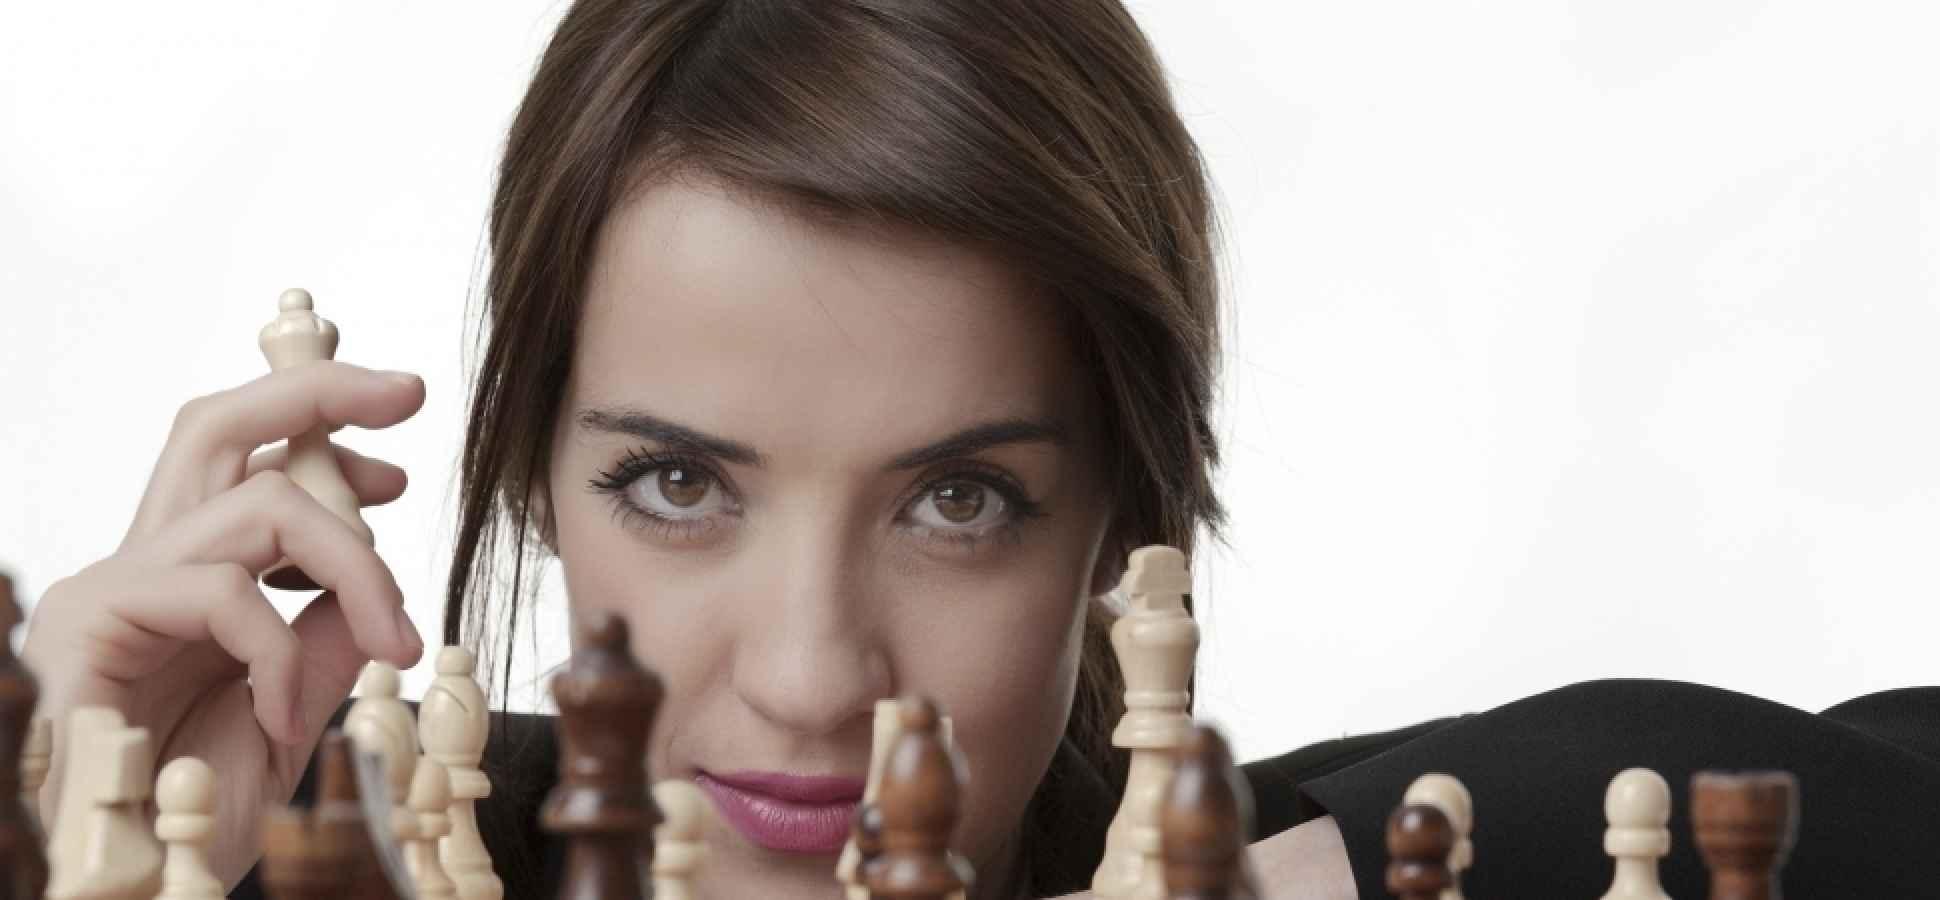 4 Hacks to Make You a Strong Negotiator